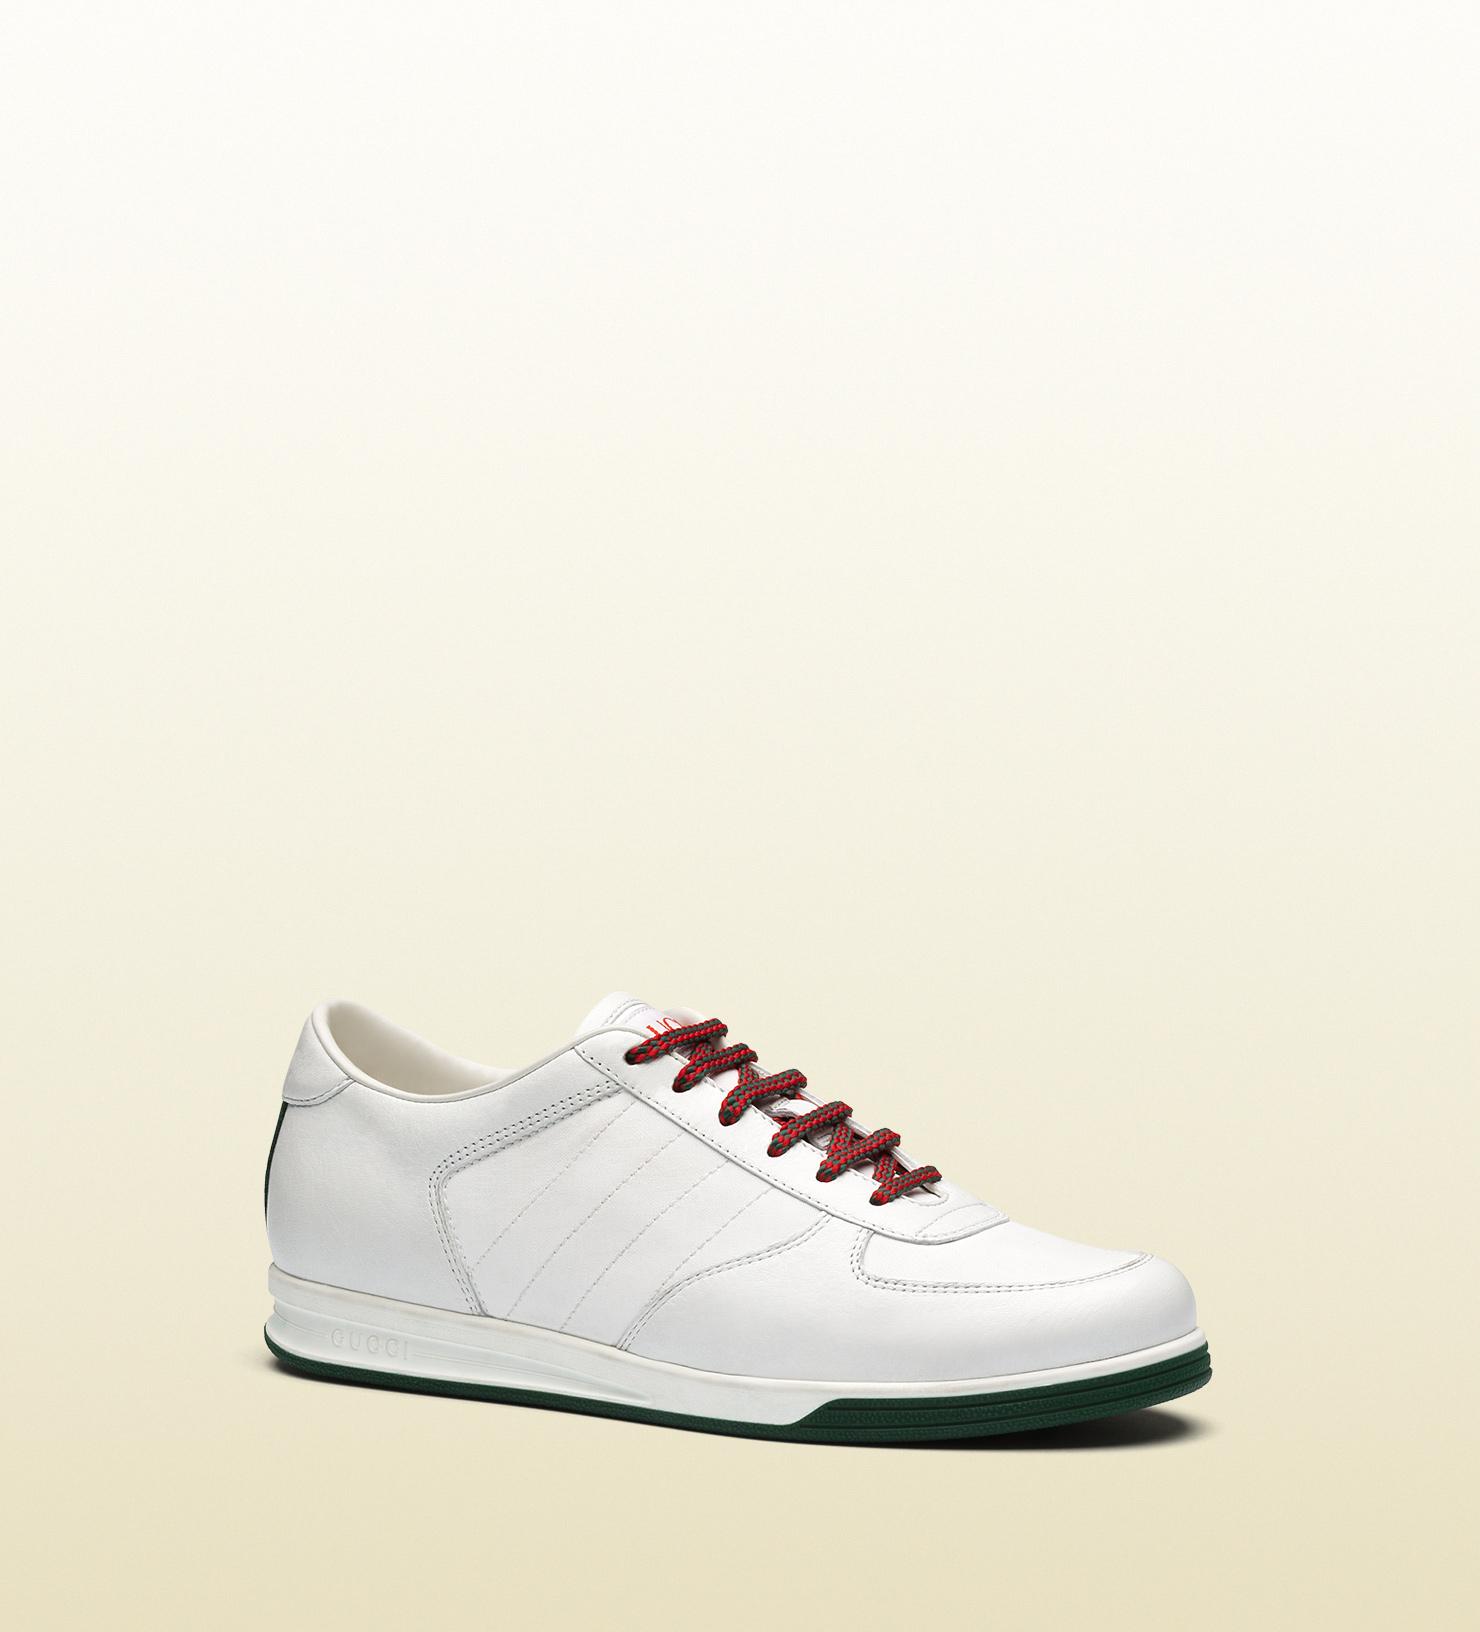 Classic Gucci Tennis Shoes